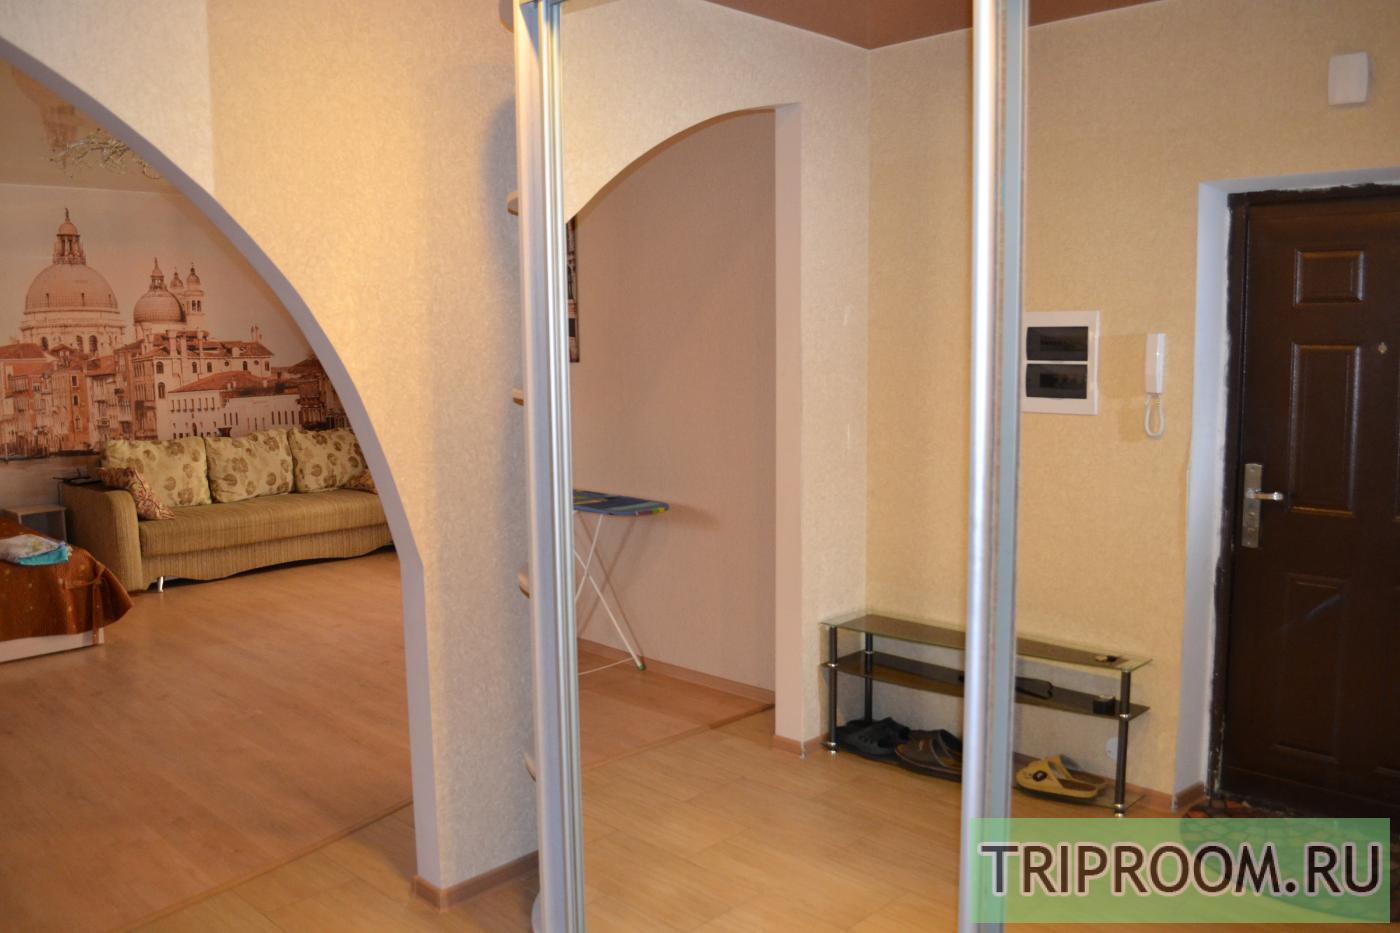 1-комнатная квартира посуточно (вариант № 591), ул. Революции проспект, фото № 11